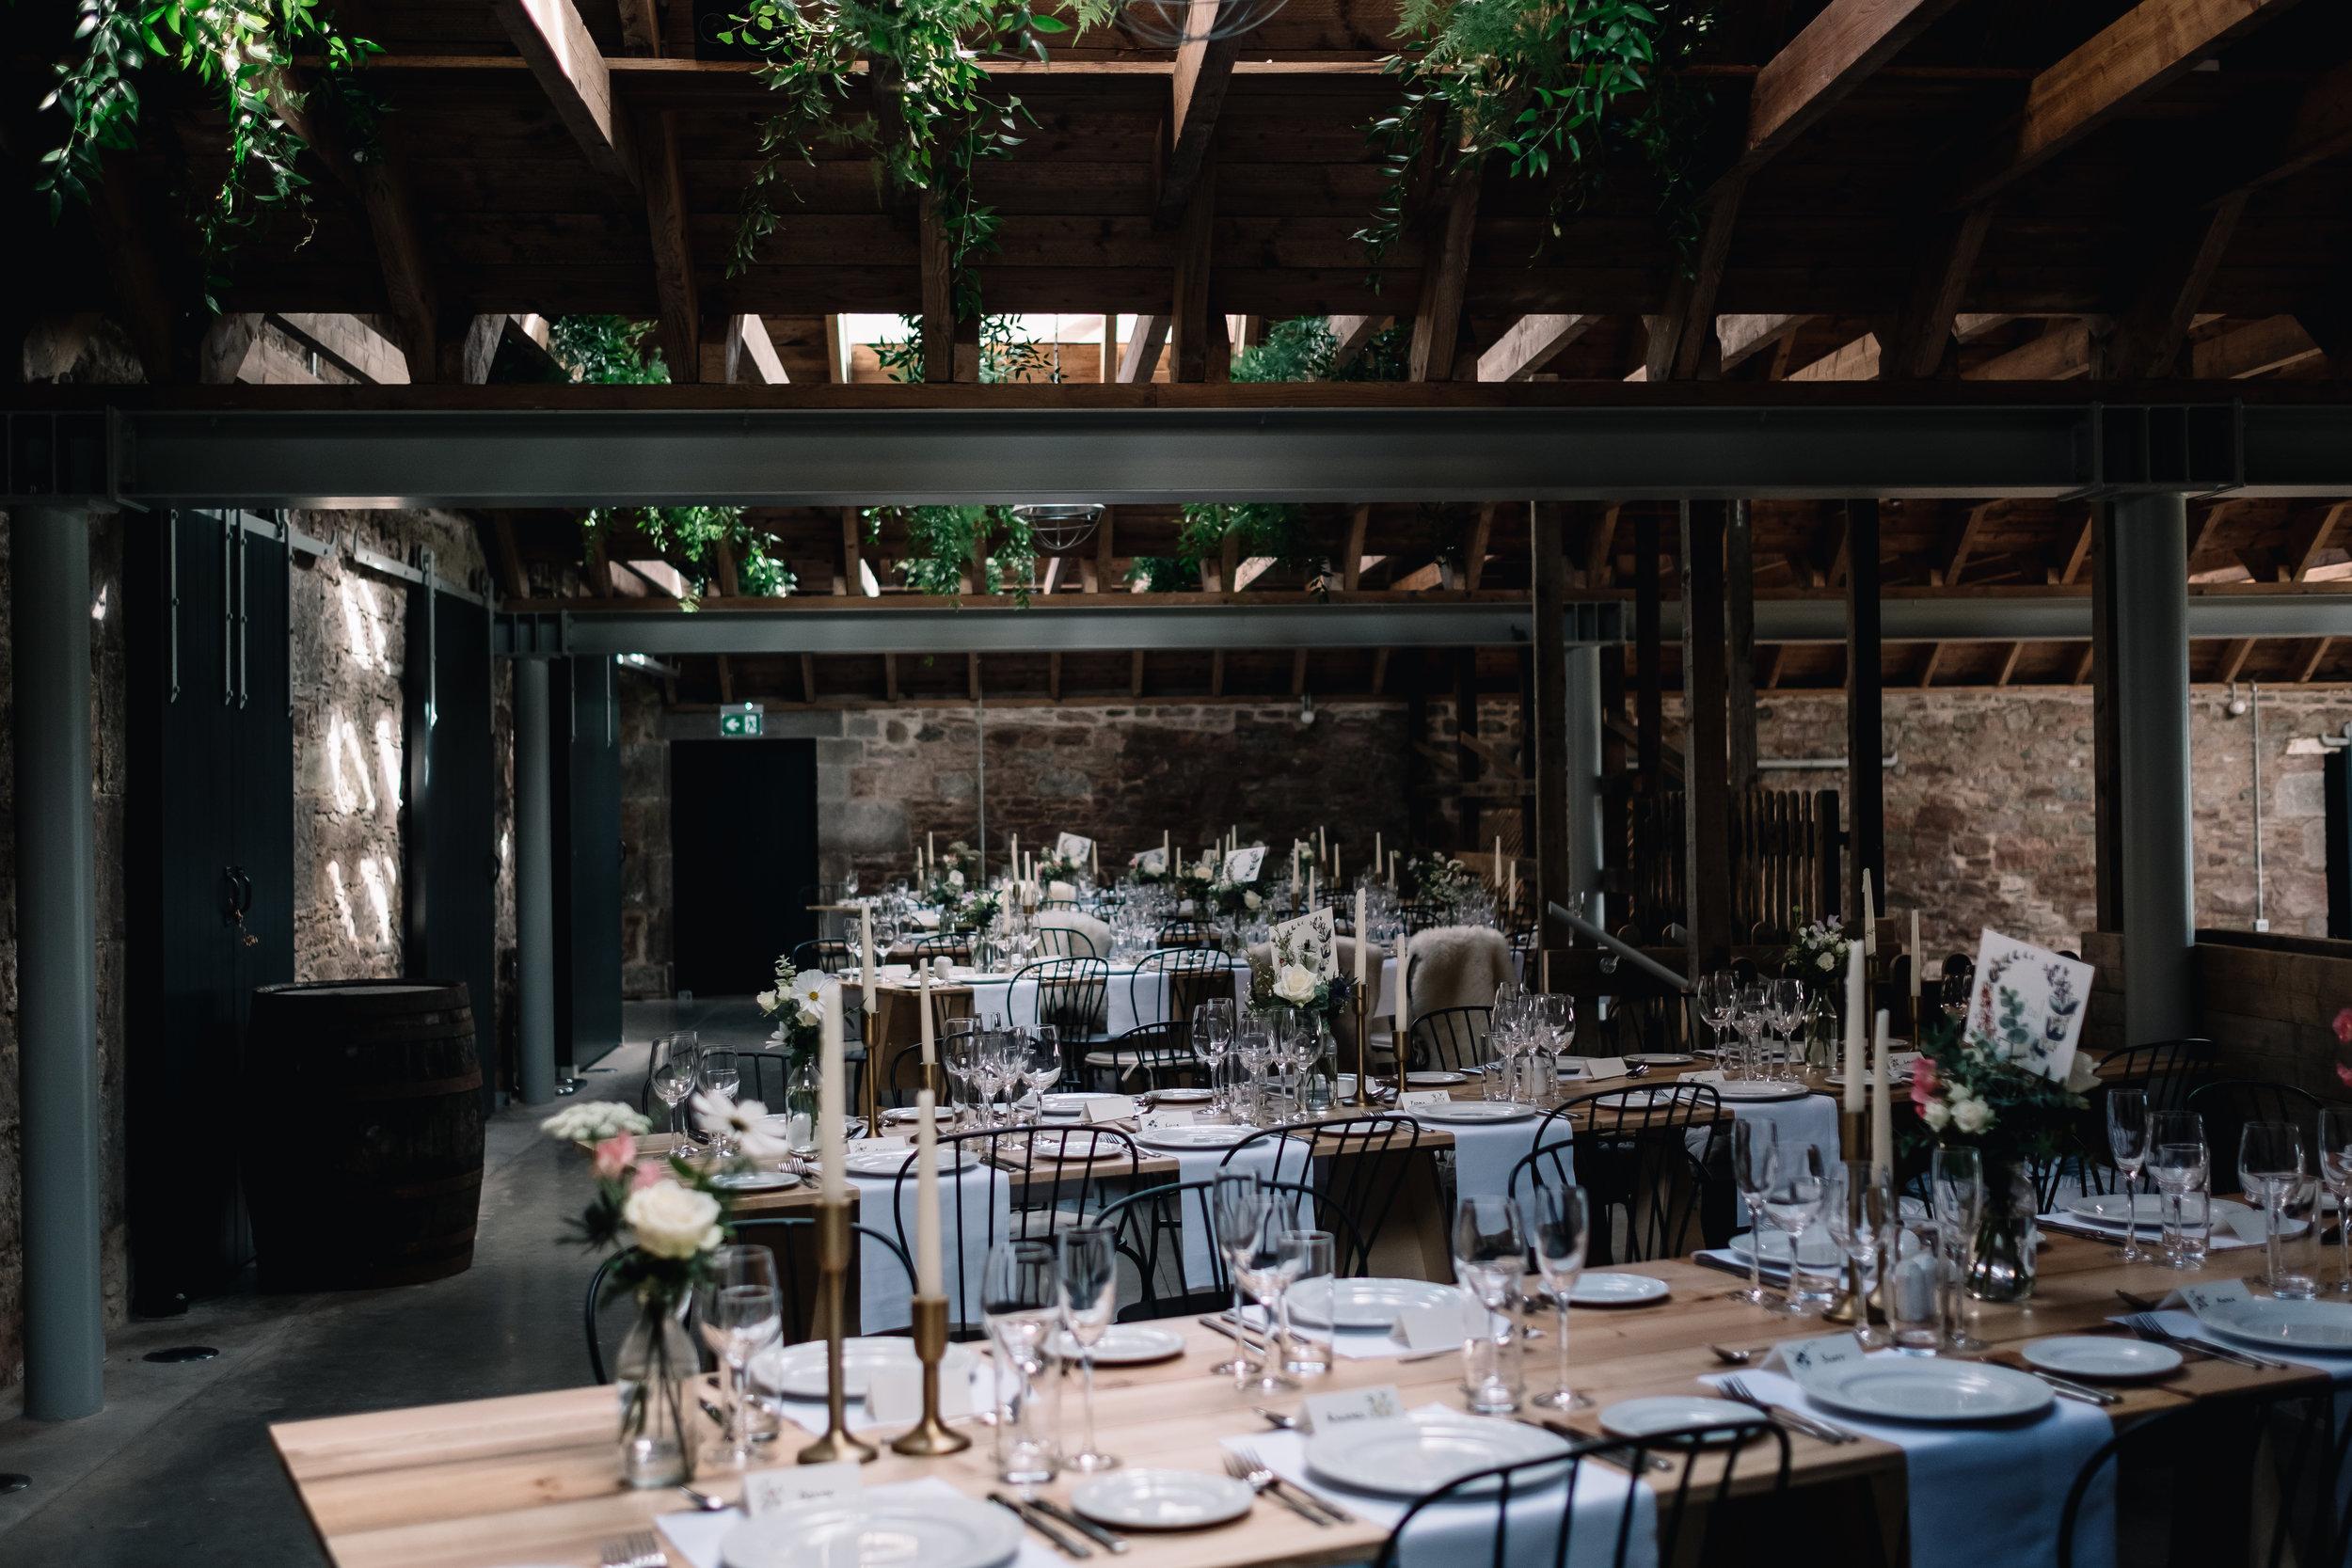 325-Rebeca-Tom-Wedding-Guardswell.JPG